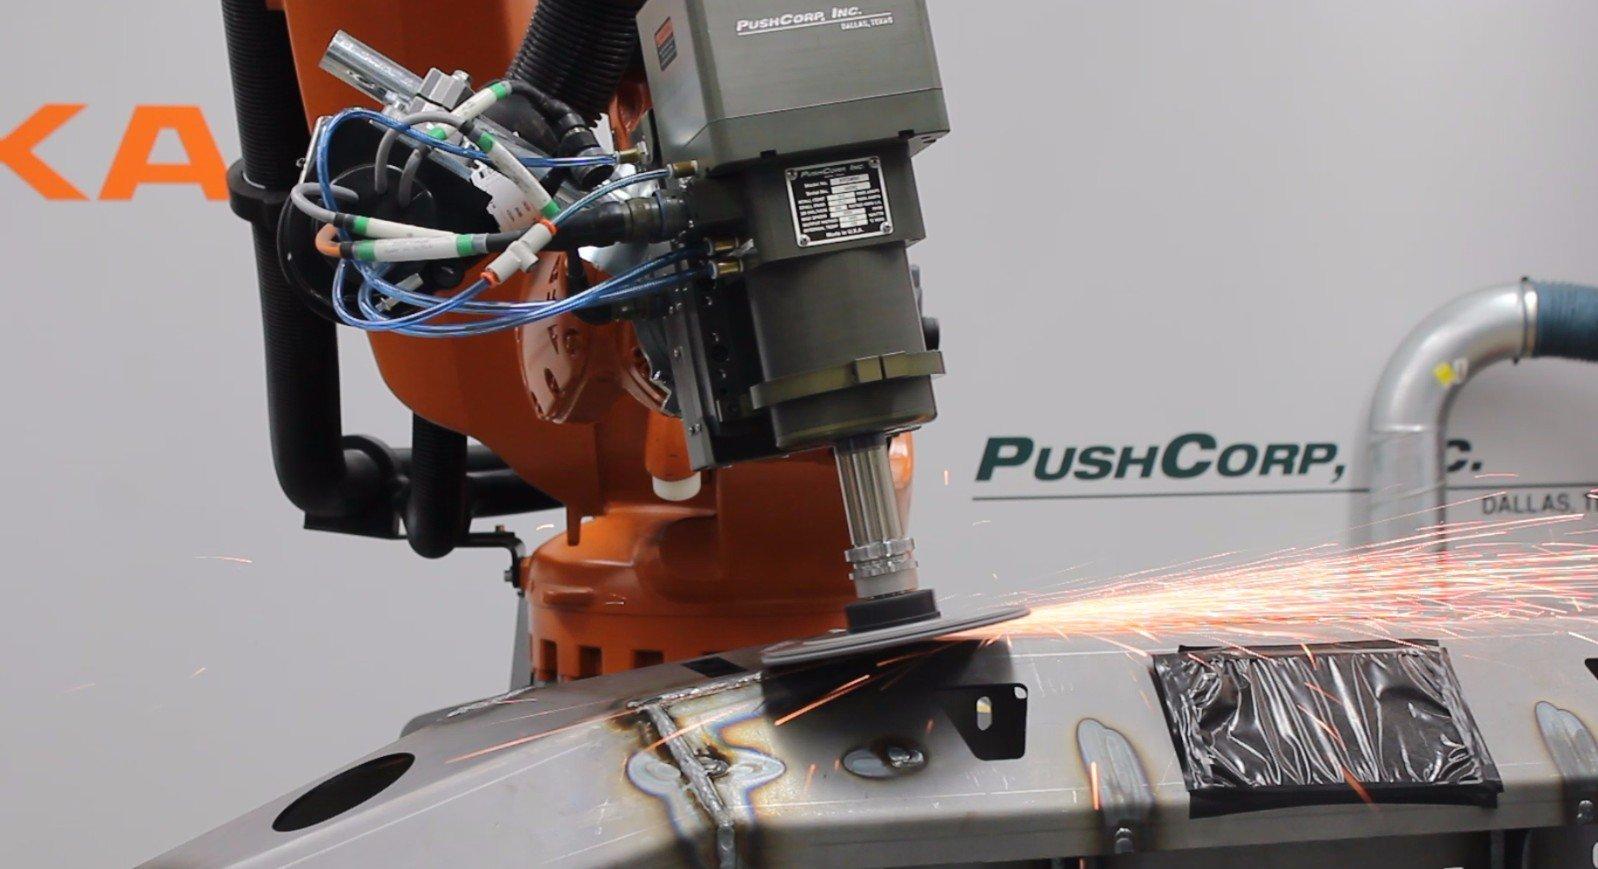 PushCorp Inc